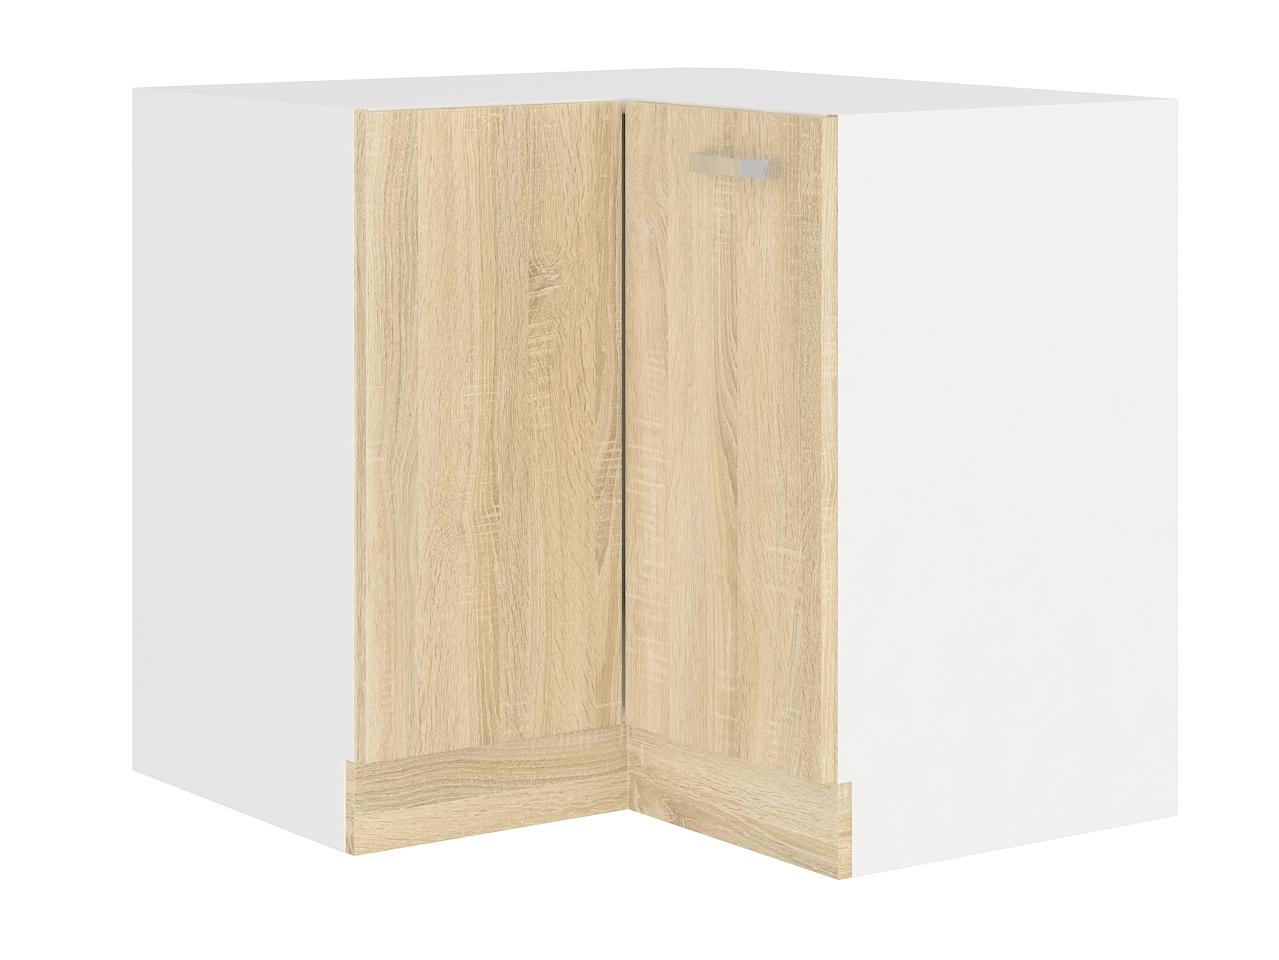 SARA SONOMA, skříňka dolní rohová 89/89 cm, 90/90 DN BB, bílá/dub sonoma